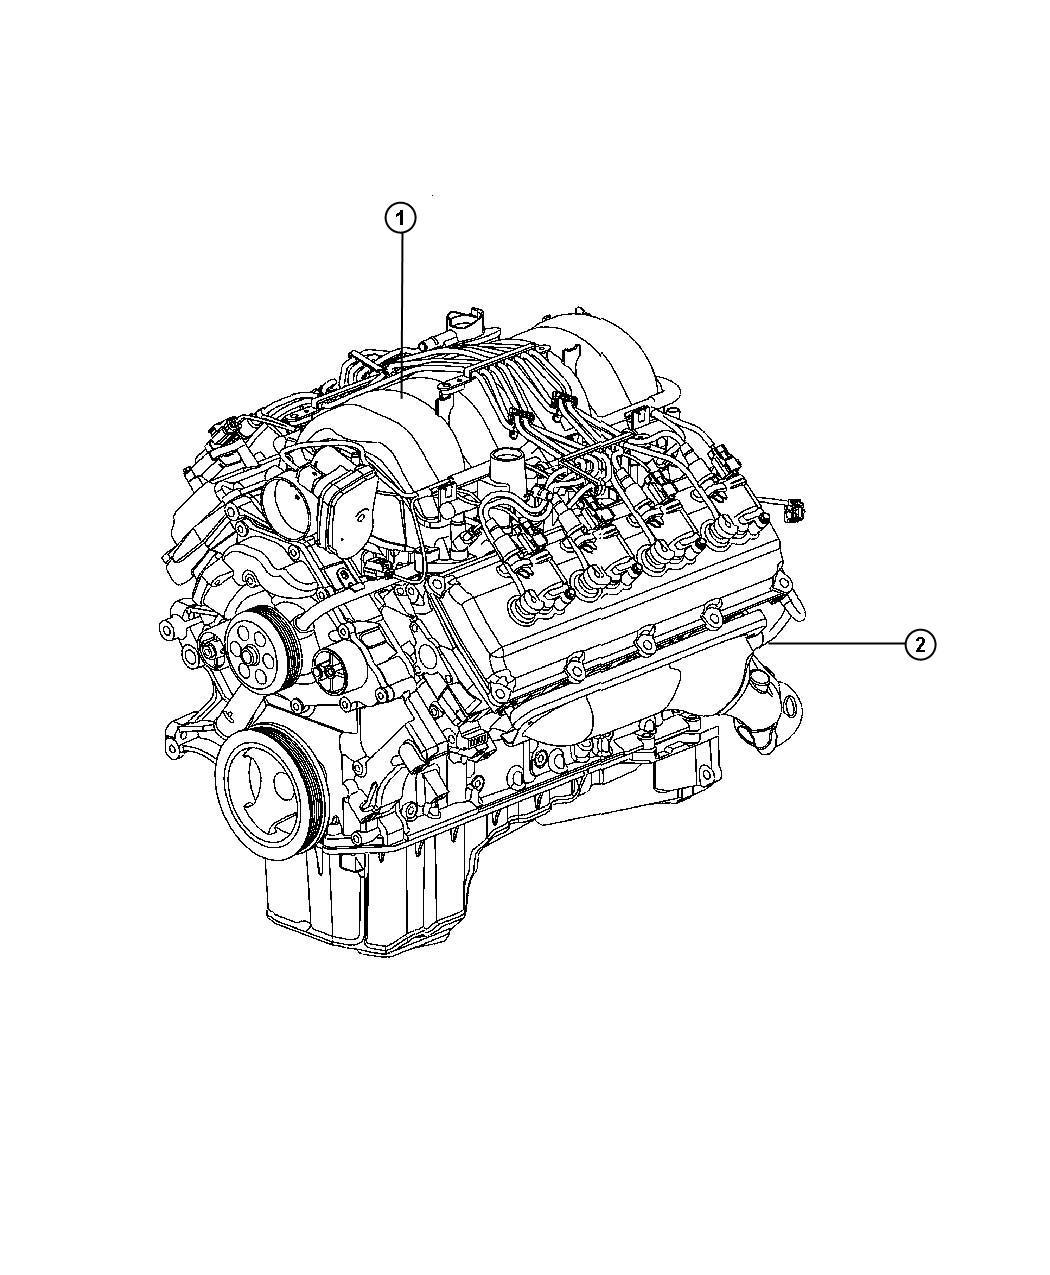 Dodge Ram 2500 Engine. Long block. Remanufactured. Failure